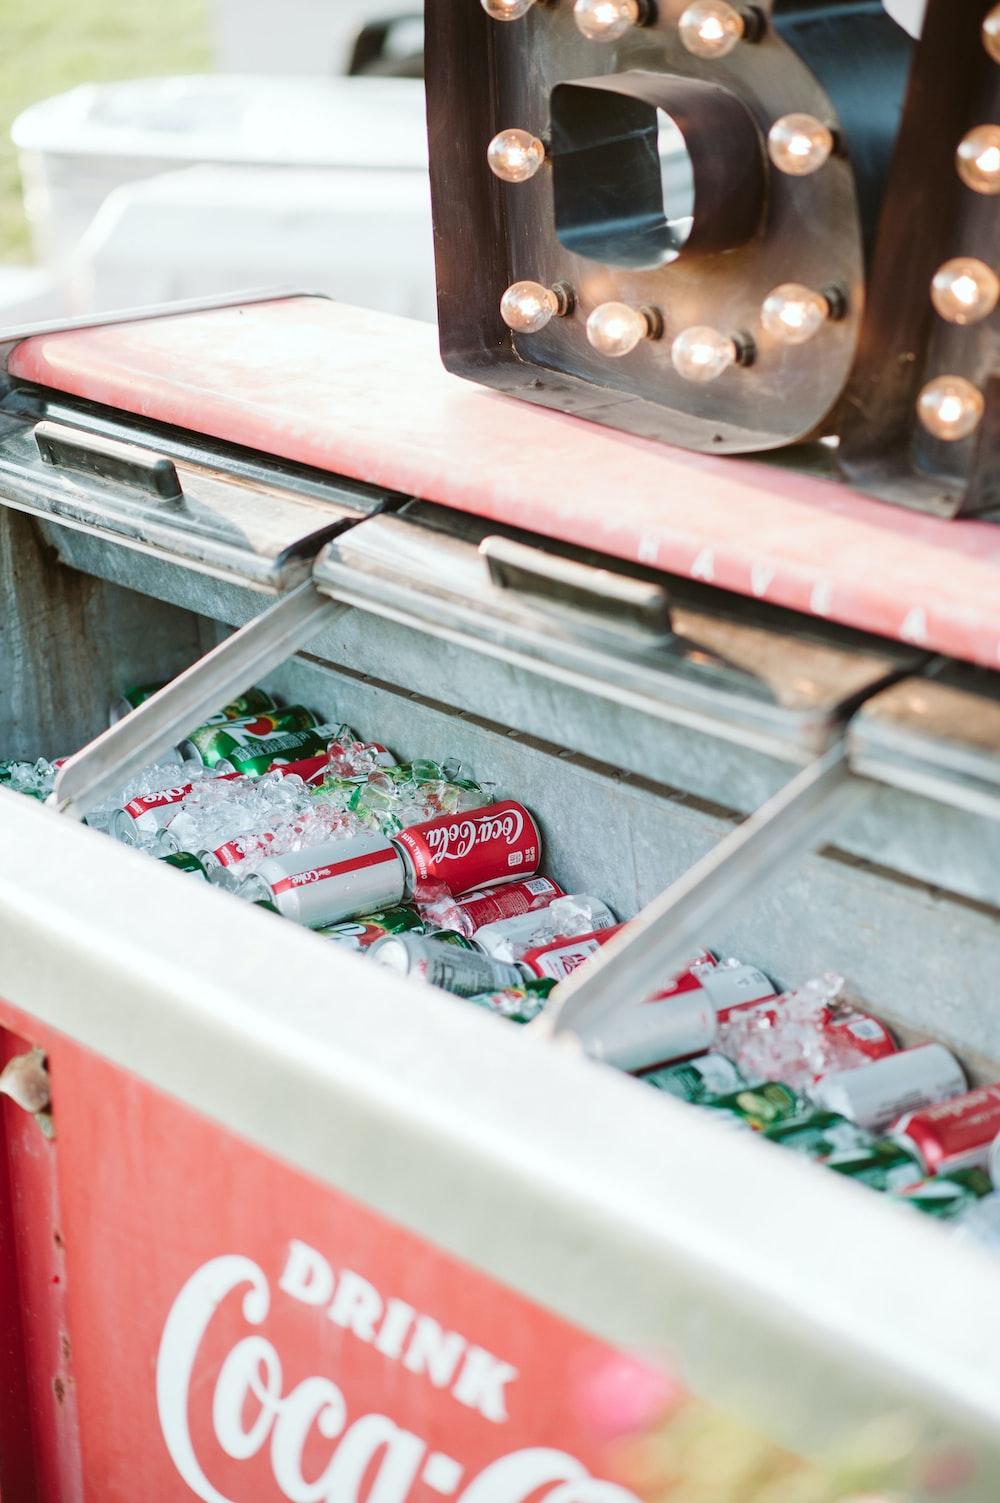 white and red Coca-Cola deep freezer